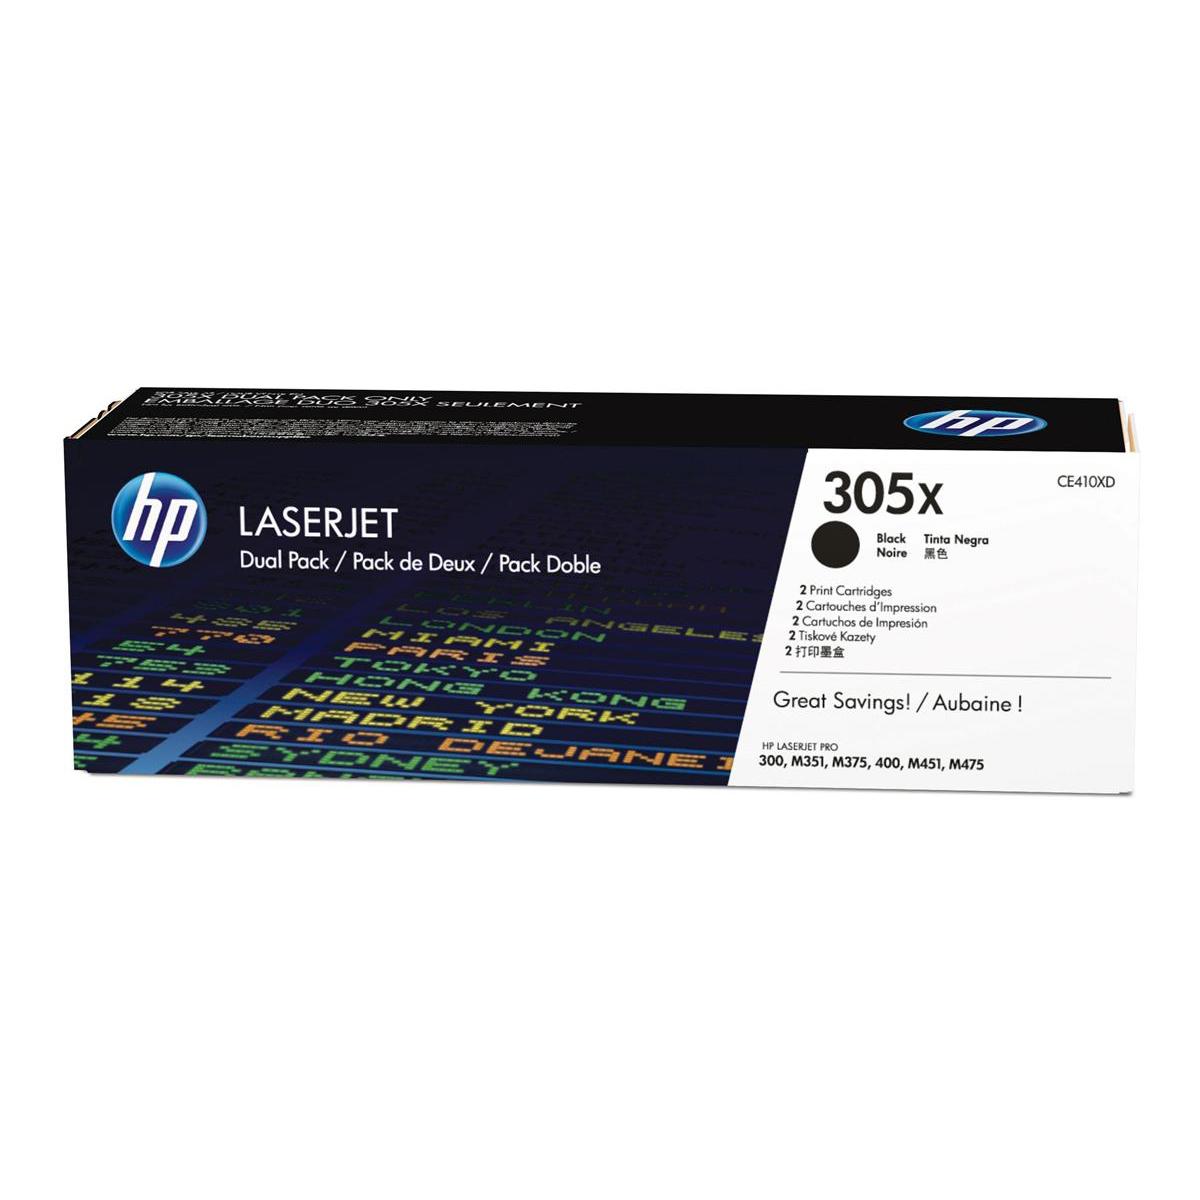 HP 305X LaserJet Toner Cartridges HighYield Page Life 4000pp Black Ref CE410XD [Pack 2]